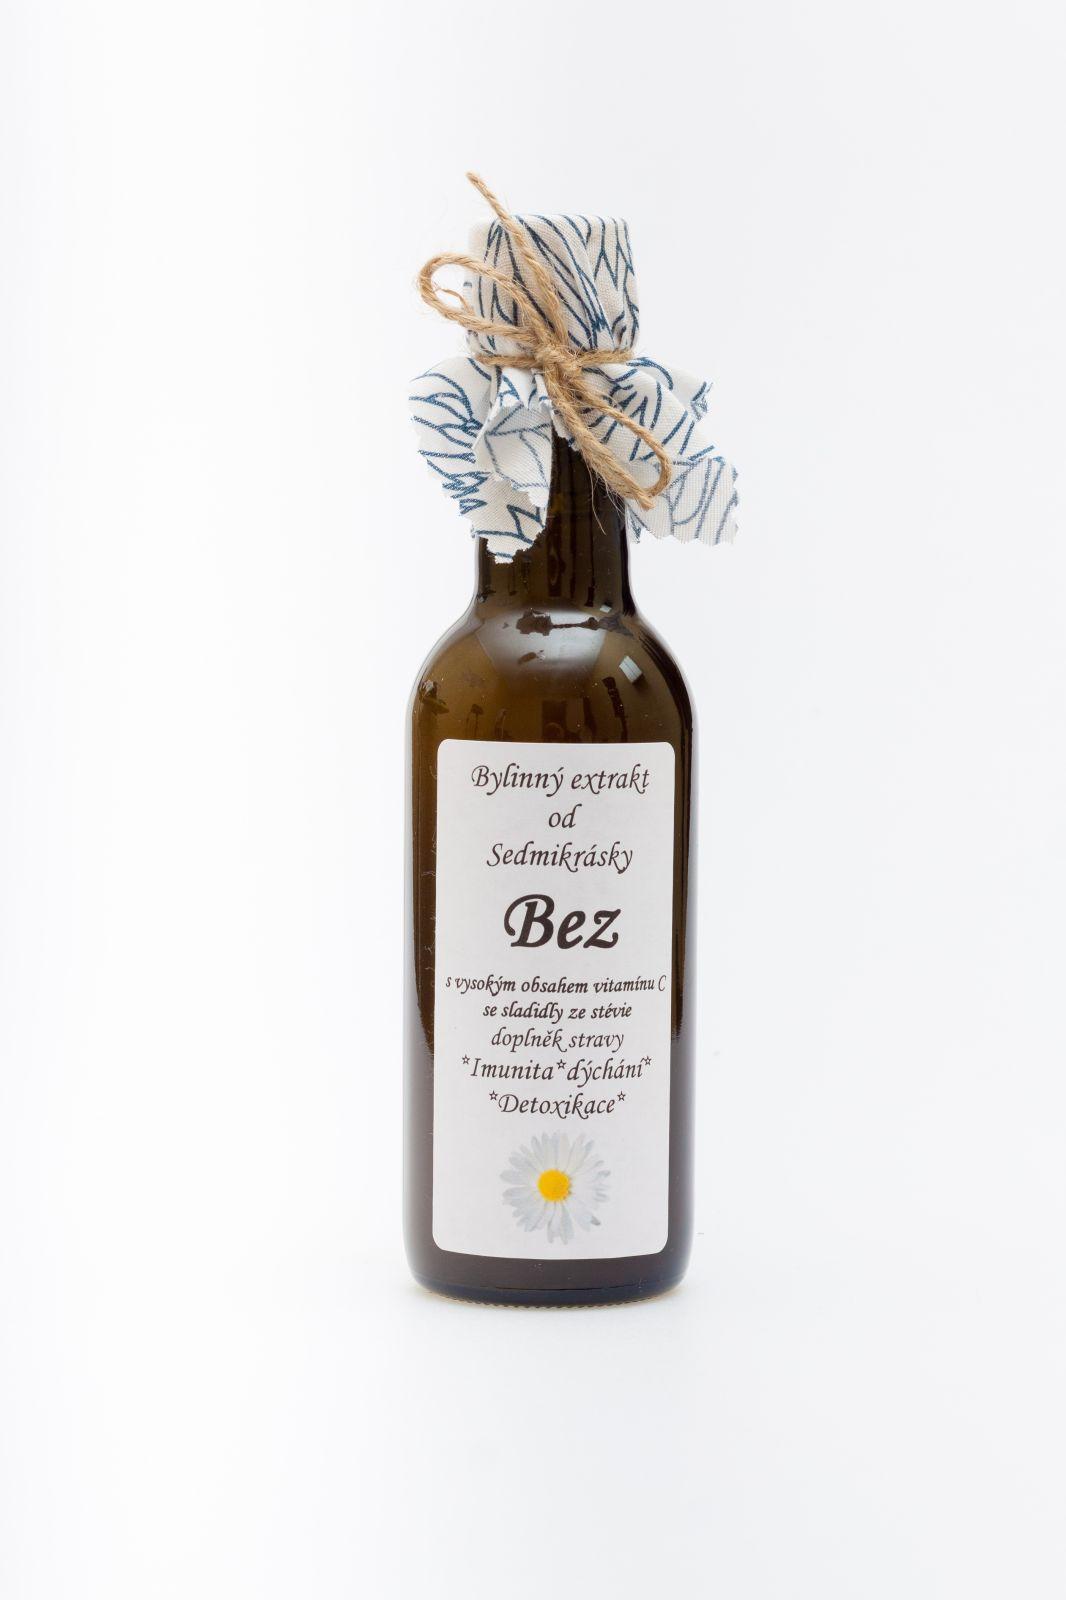 Sedmikráska bylinný extrak Bez 250ml imunita, dýchání, detoxikace doplněk stravy Rodinná farma Sedmikráska